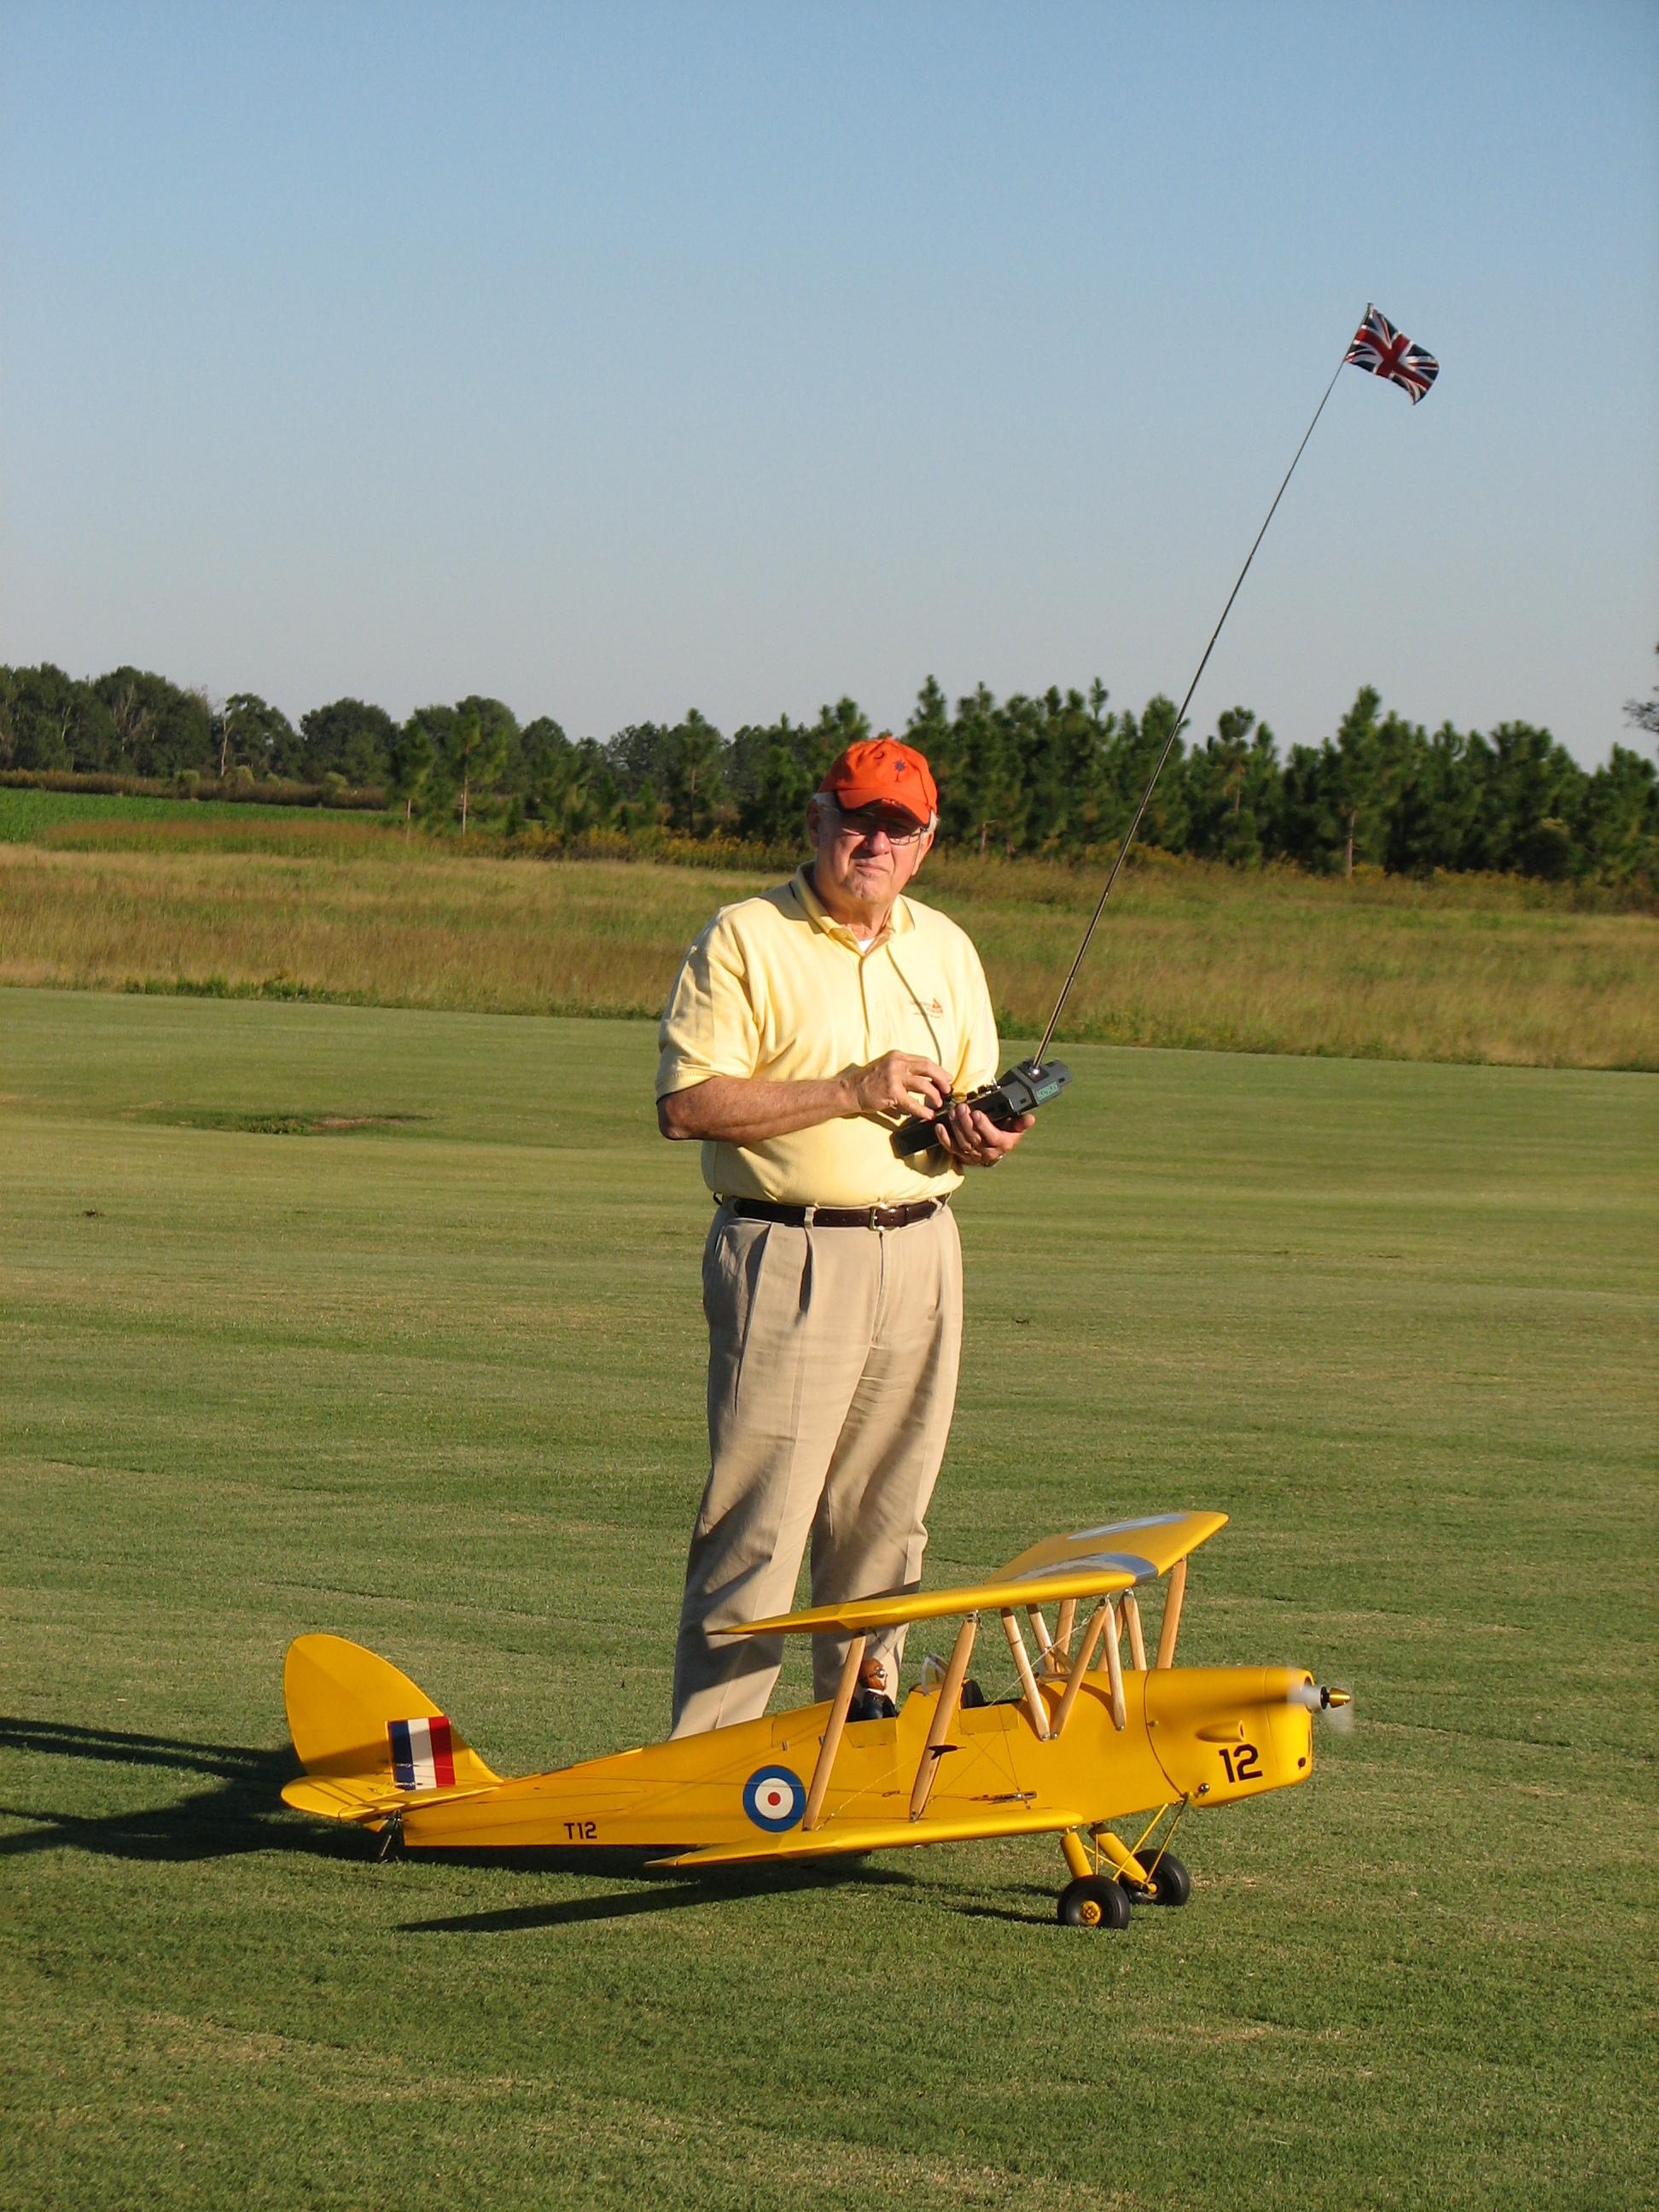 Click image for larger version  Name:Tiger Moth at Macks.jpg Views:32 Size:2.19 MB ID:2028855